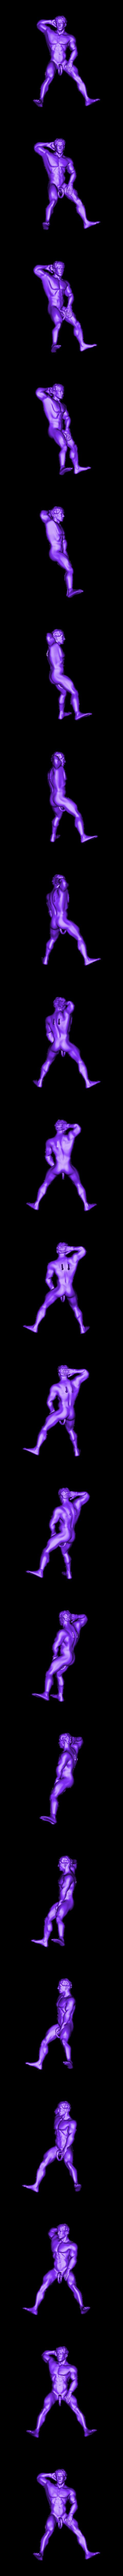 pose 4.OBJ Download OBJ file Scary movie Hanging Balls door knocker • 3D printing object, paulienet